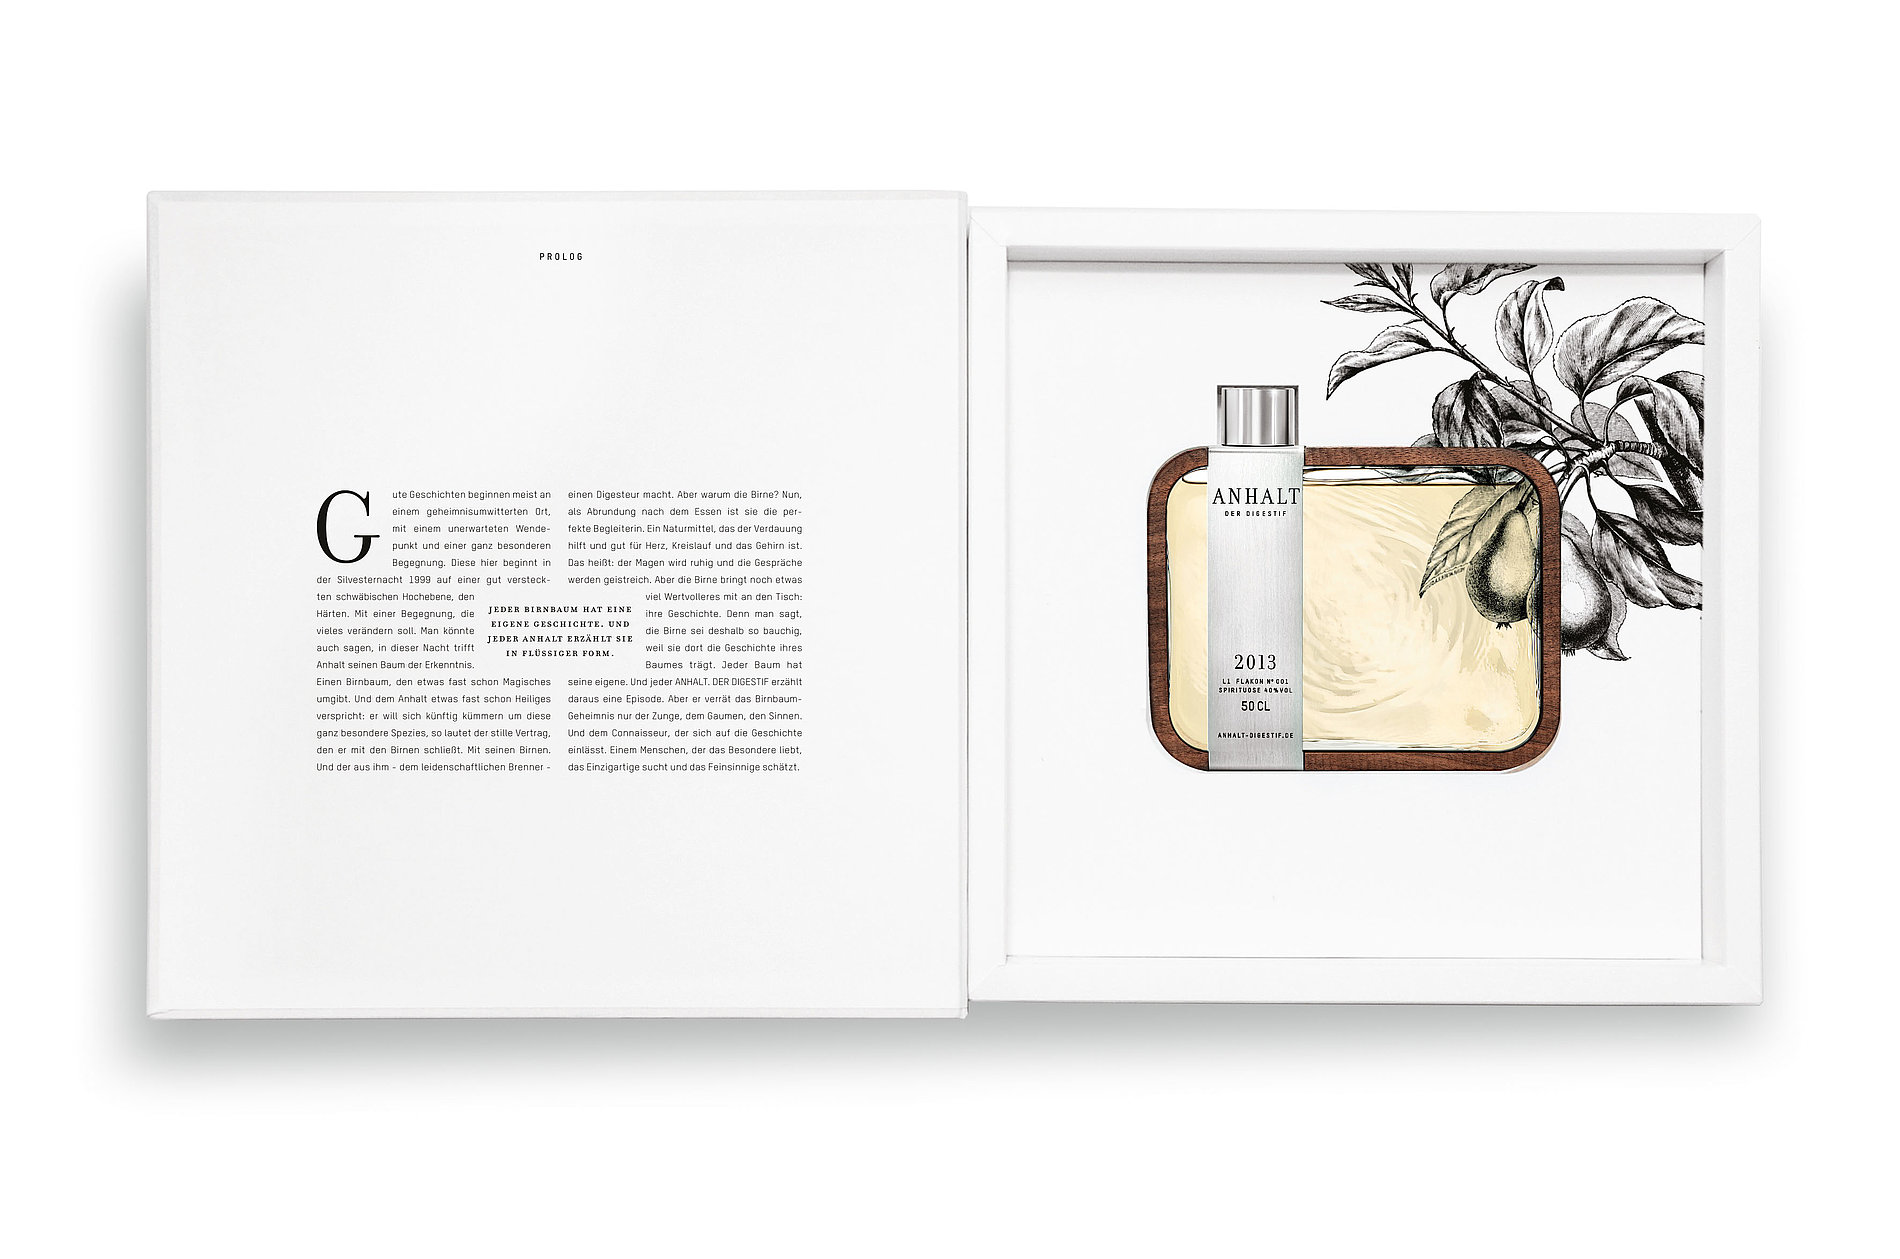 Anhalt. The Digestif. | Red Dot Design Award